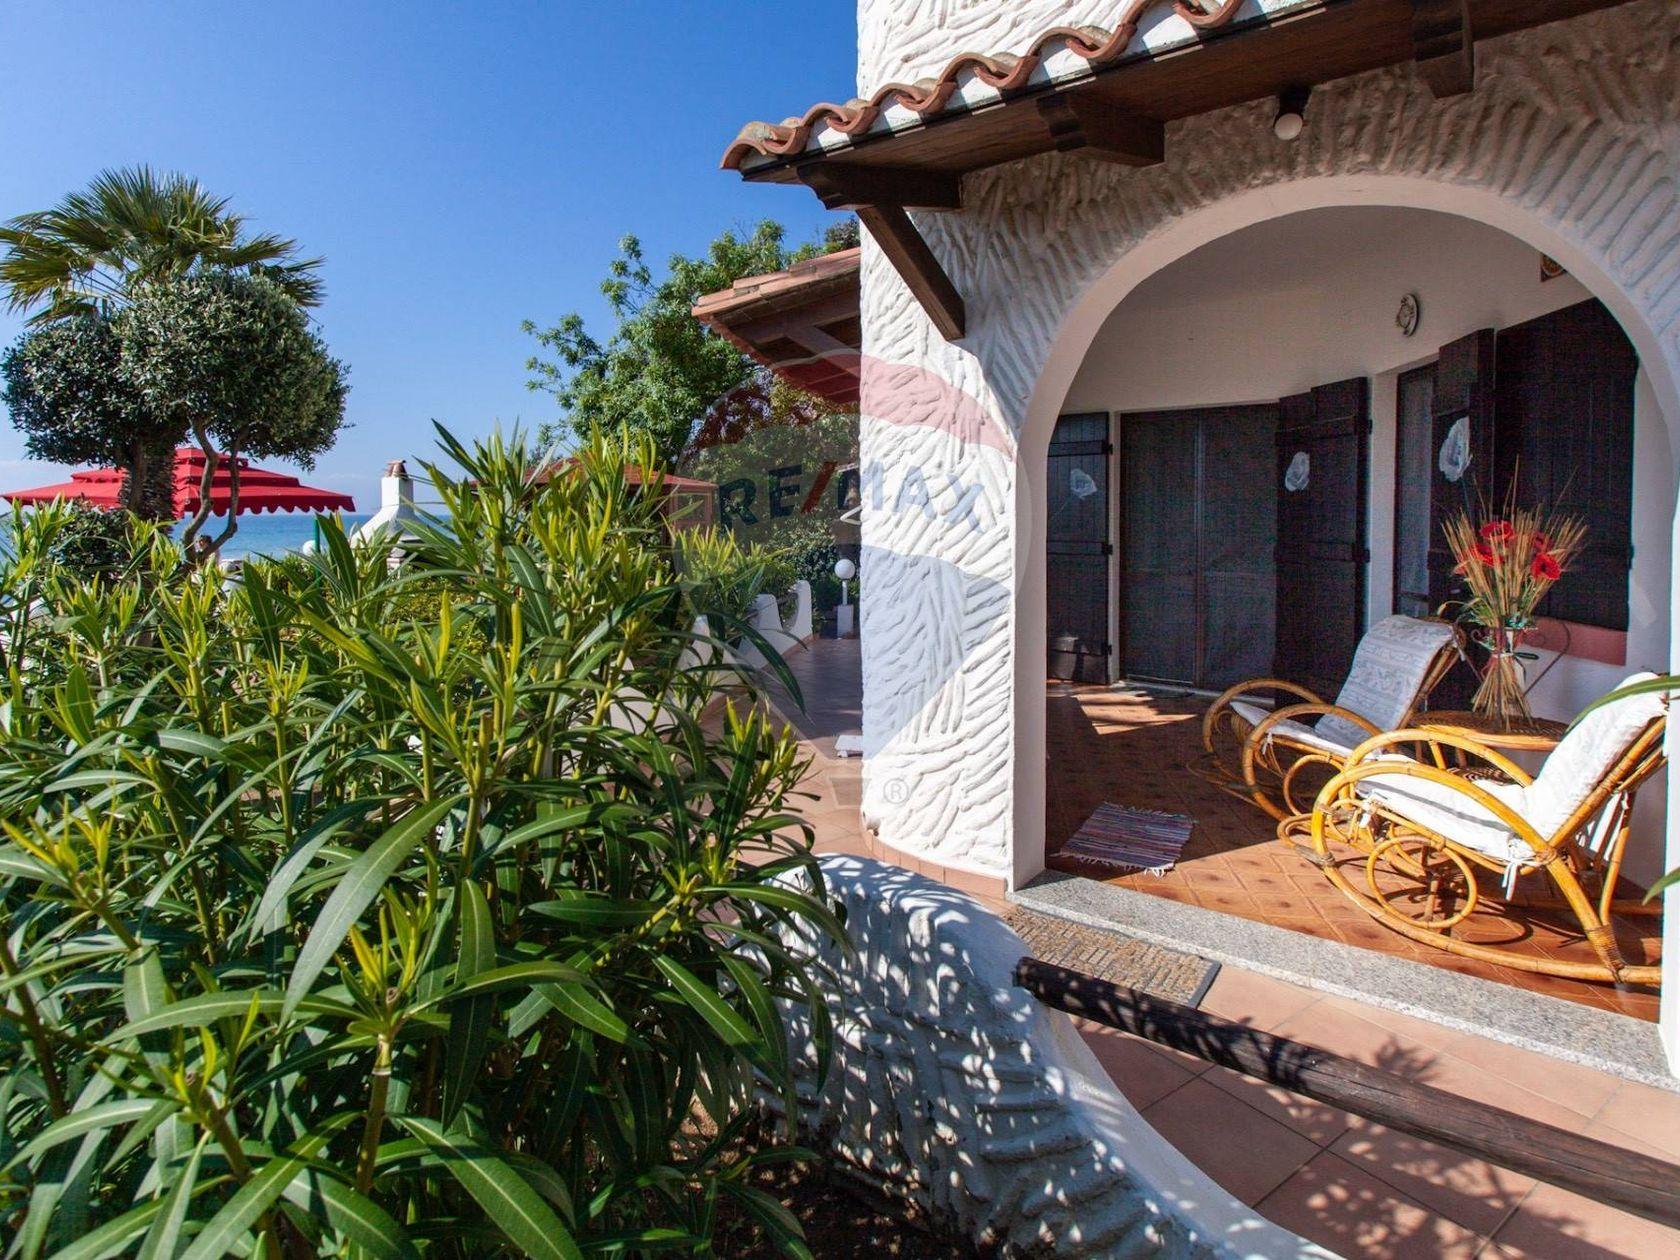 Villa singola Zona Santa Margherita, Pula, CA Vendita - Foto 16